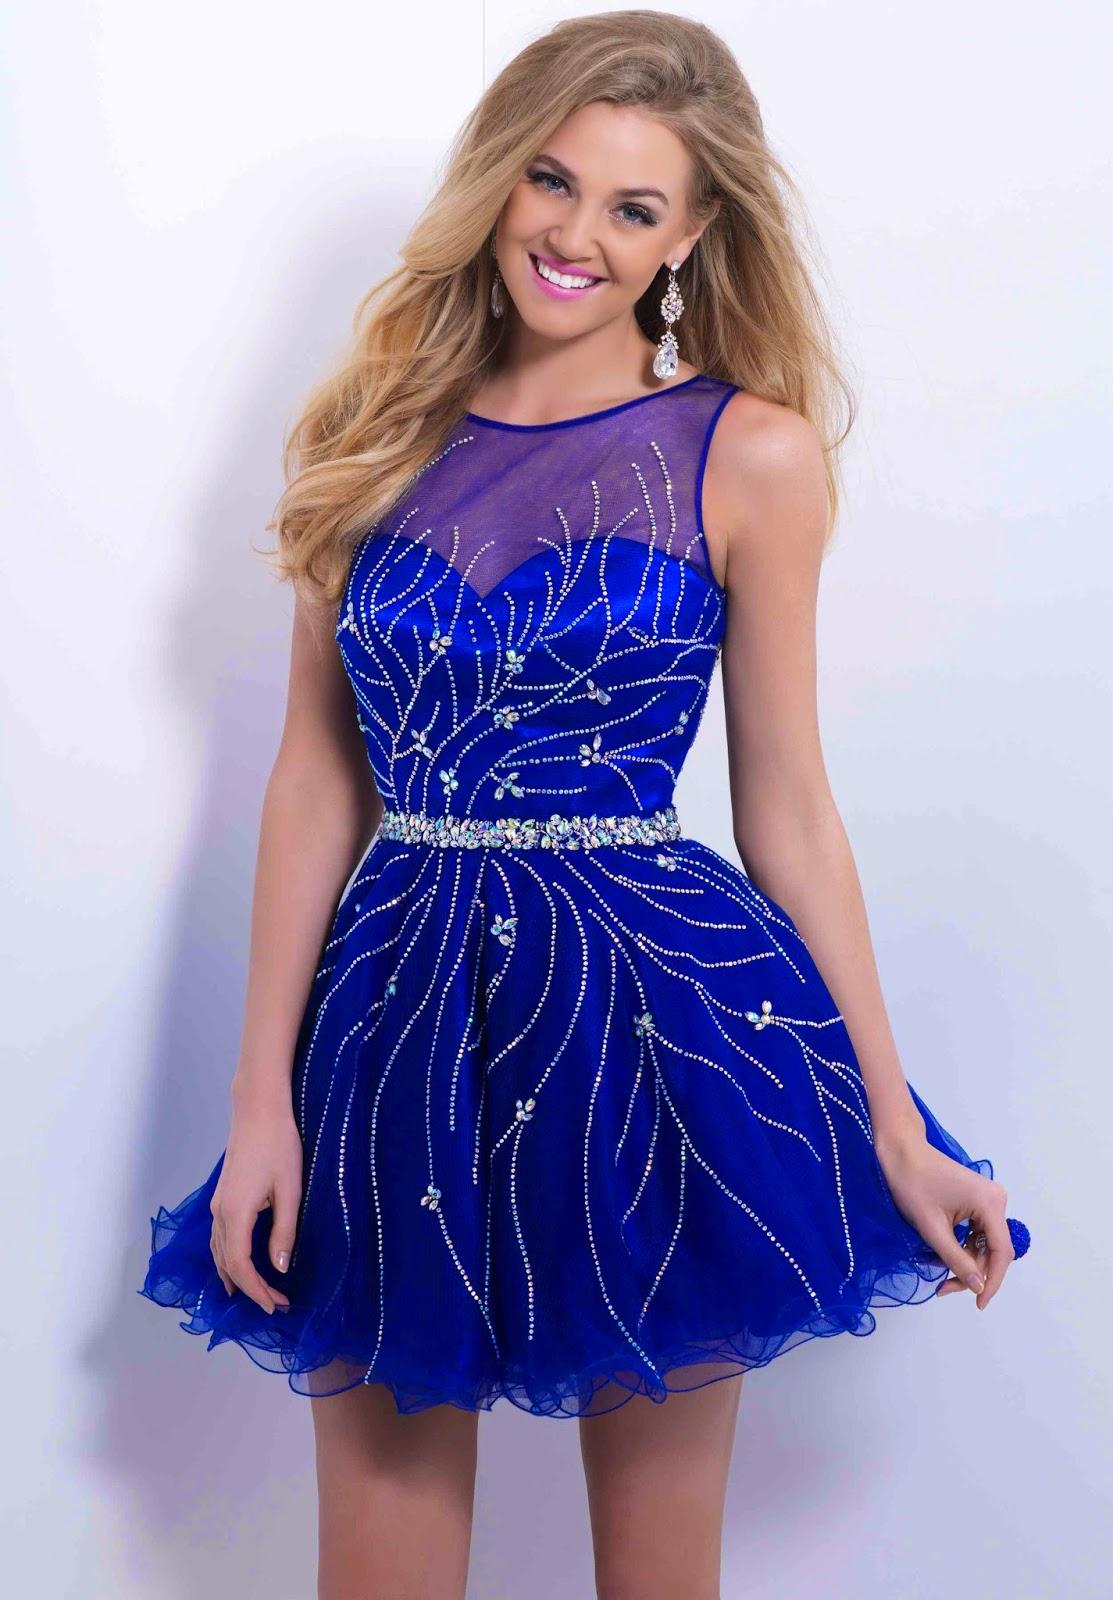 915a0c8e1e Vestidos de graduacion hermosos – Vestidos hermosos y de moda 2018